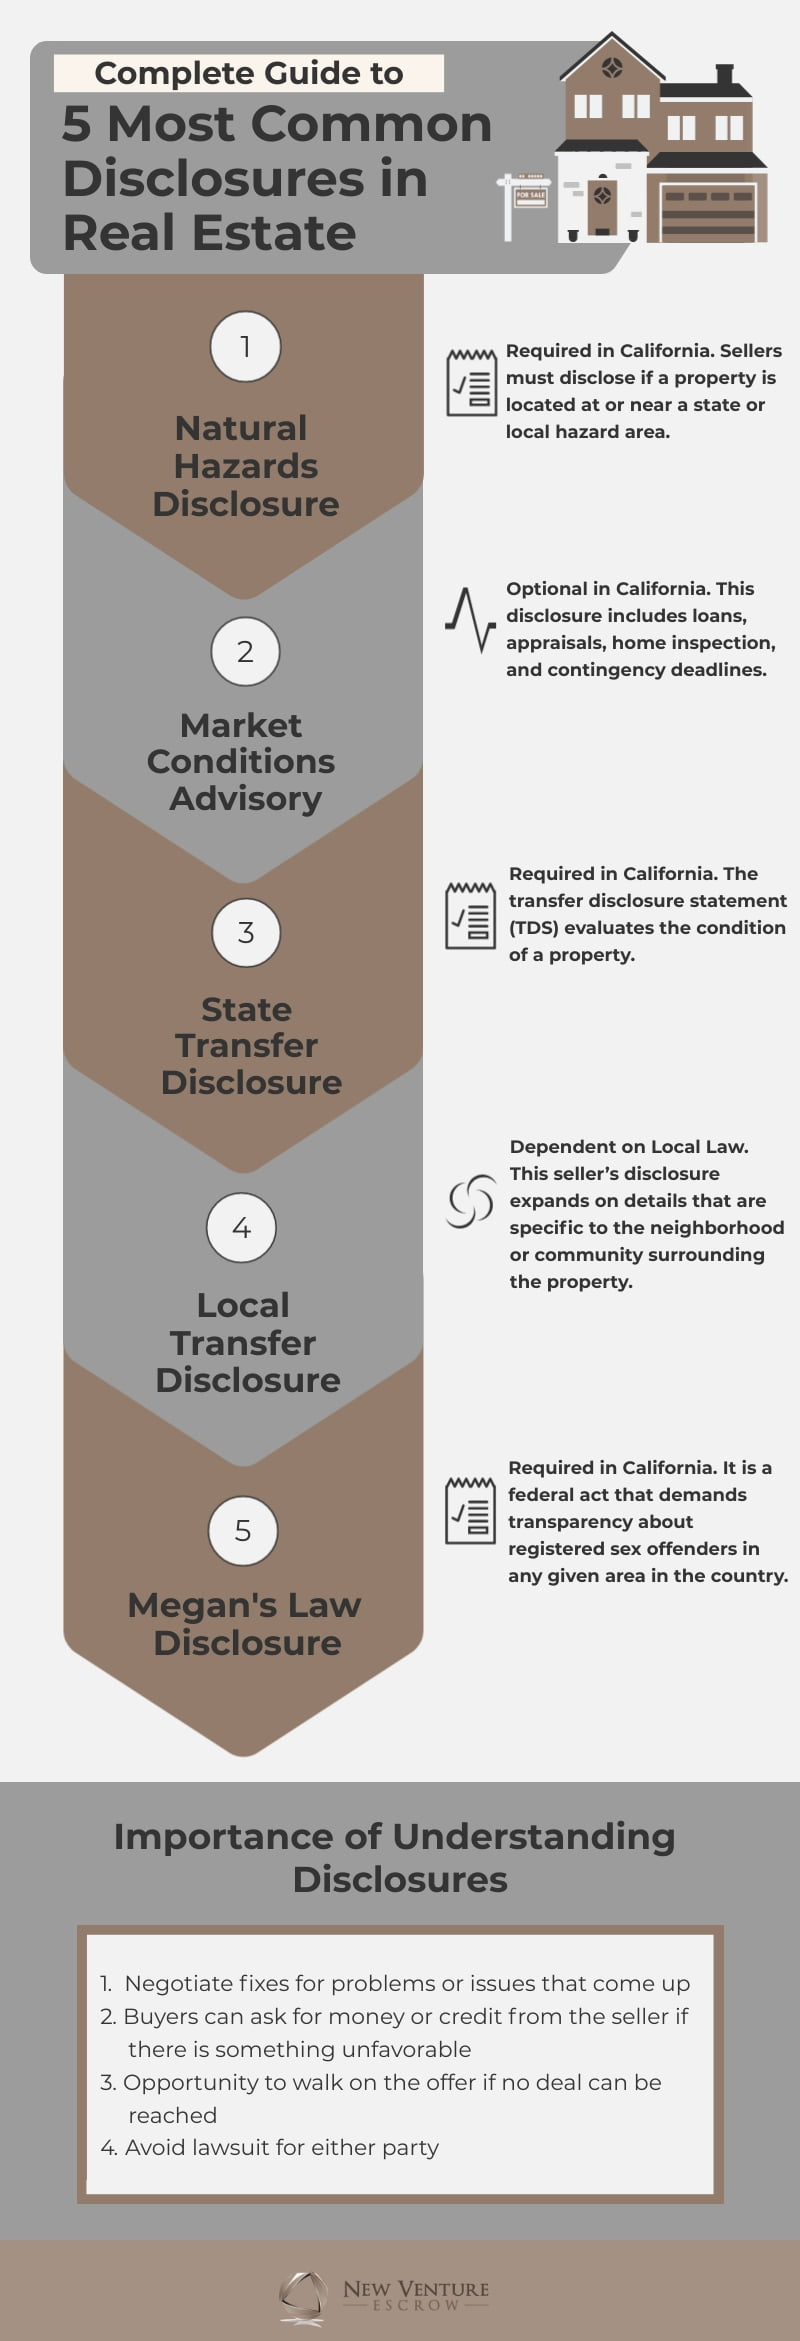 disclosures real estate